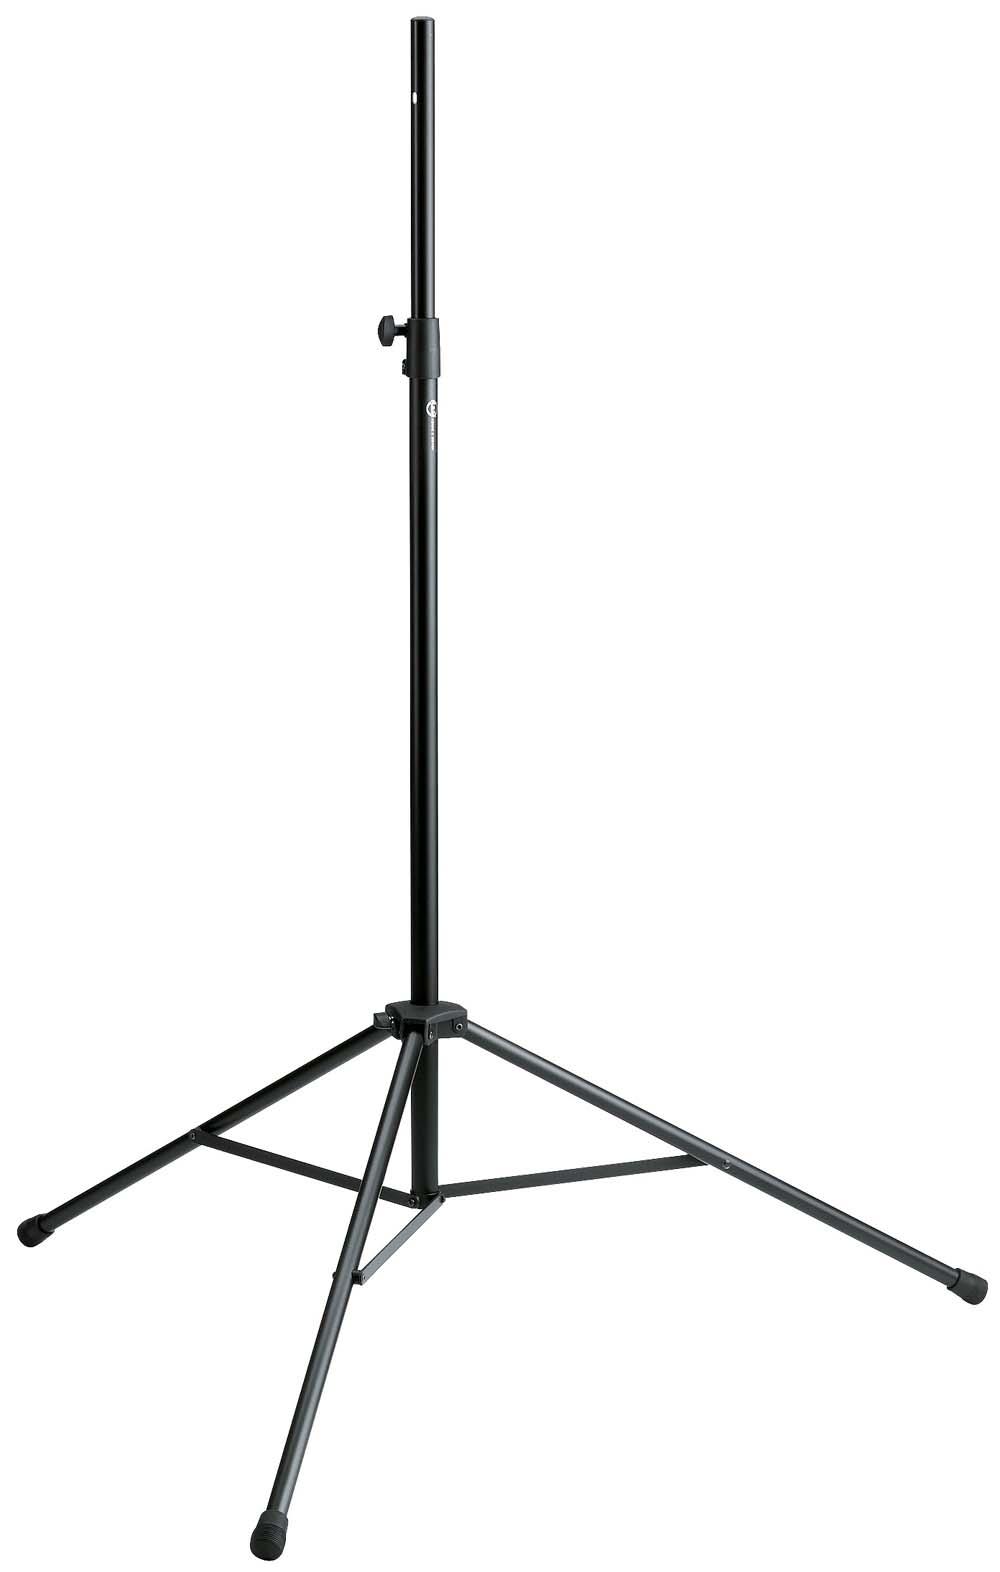 KM 21420 L/duty speaker stand